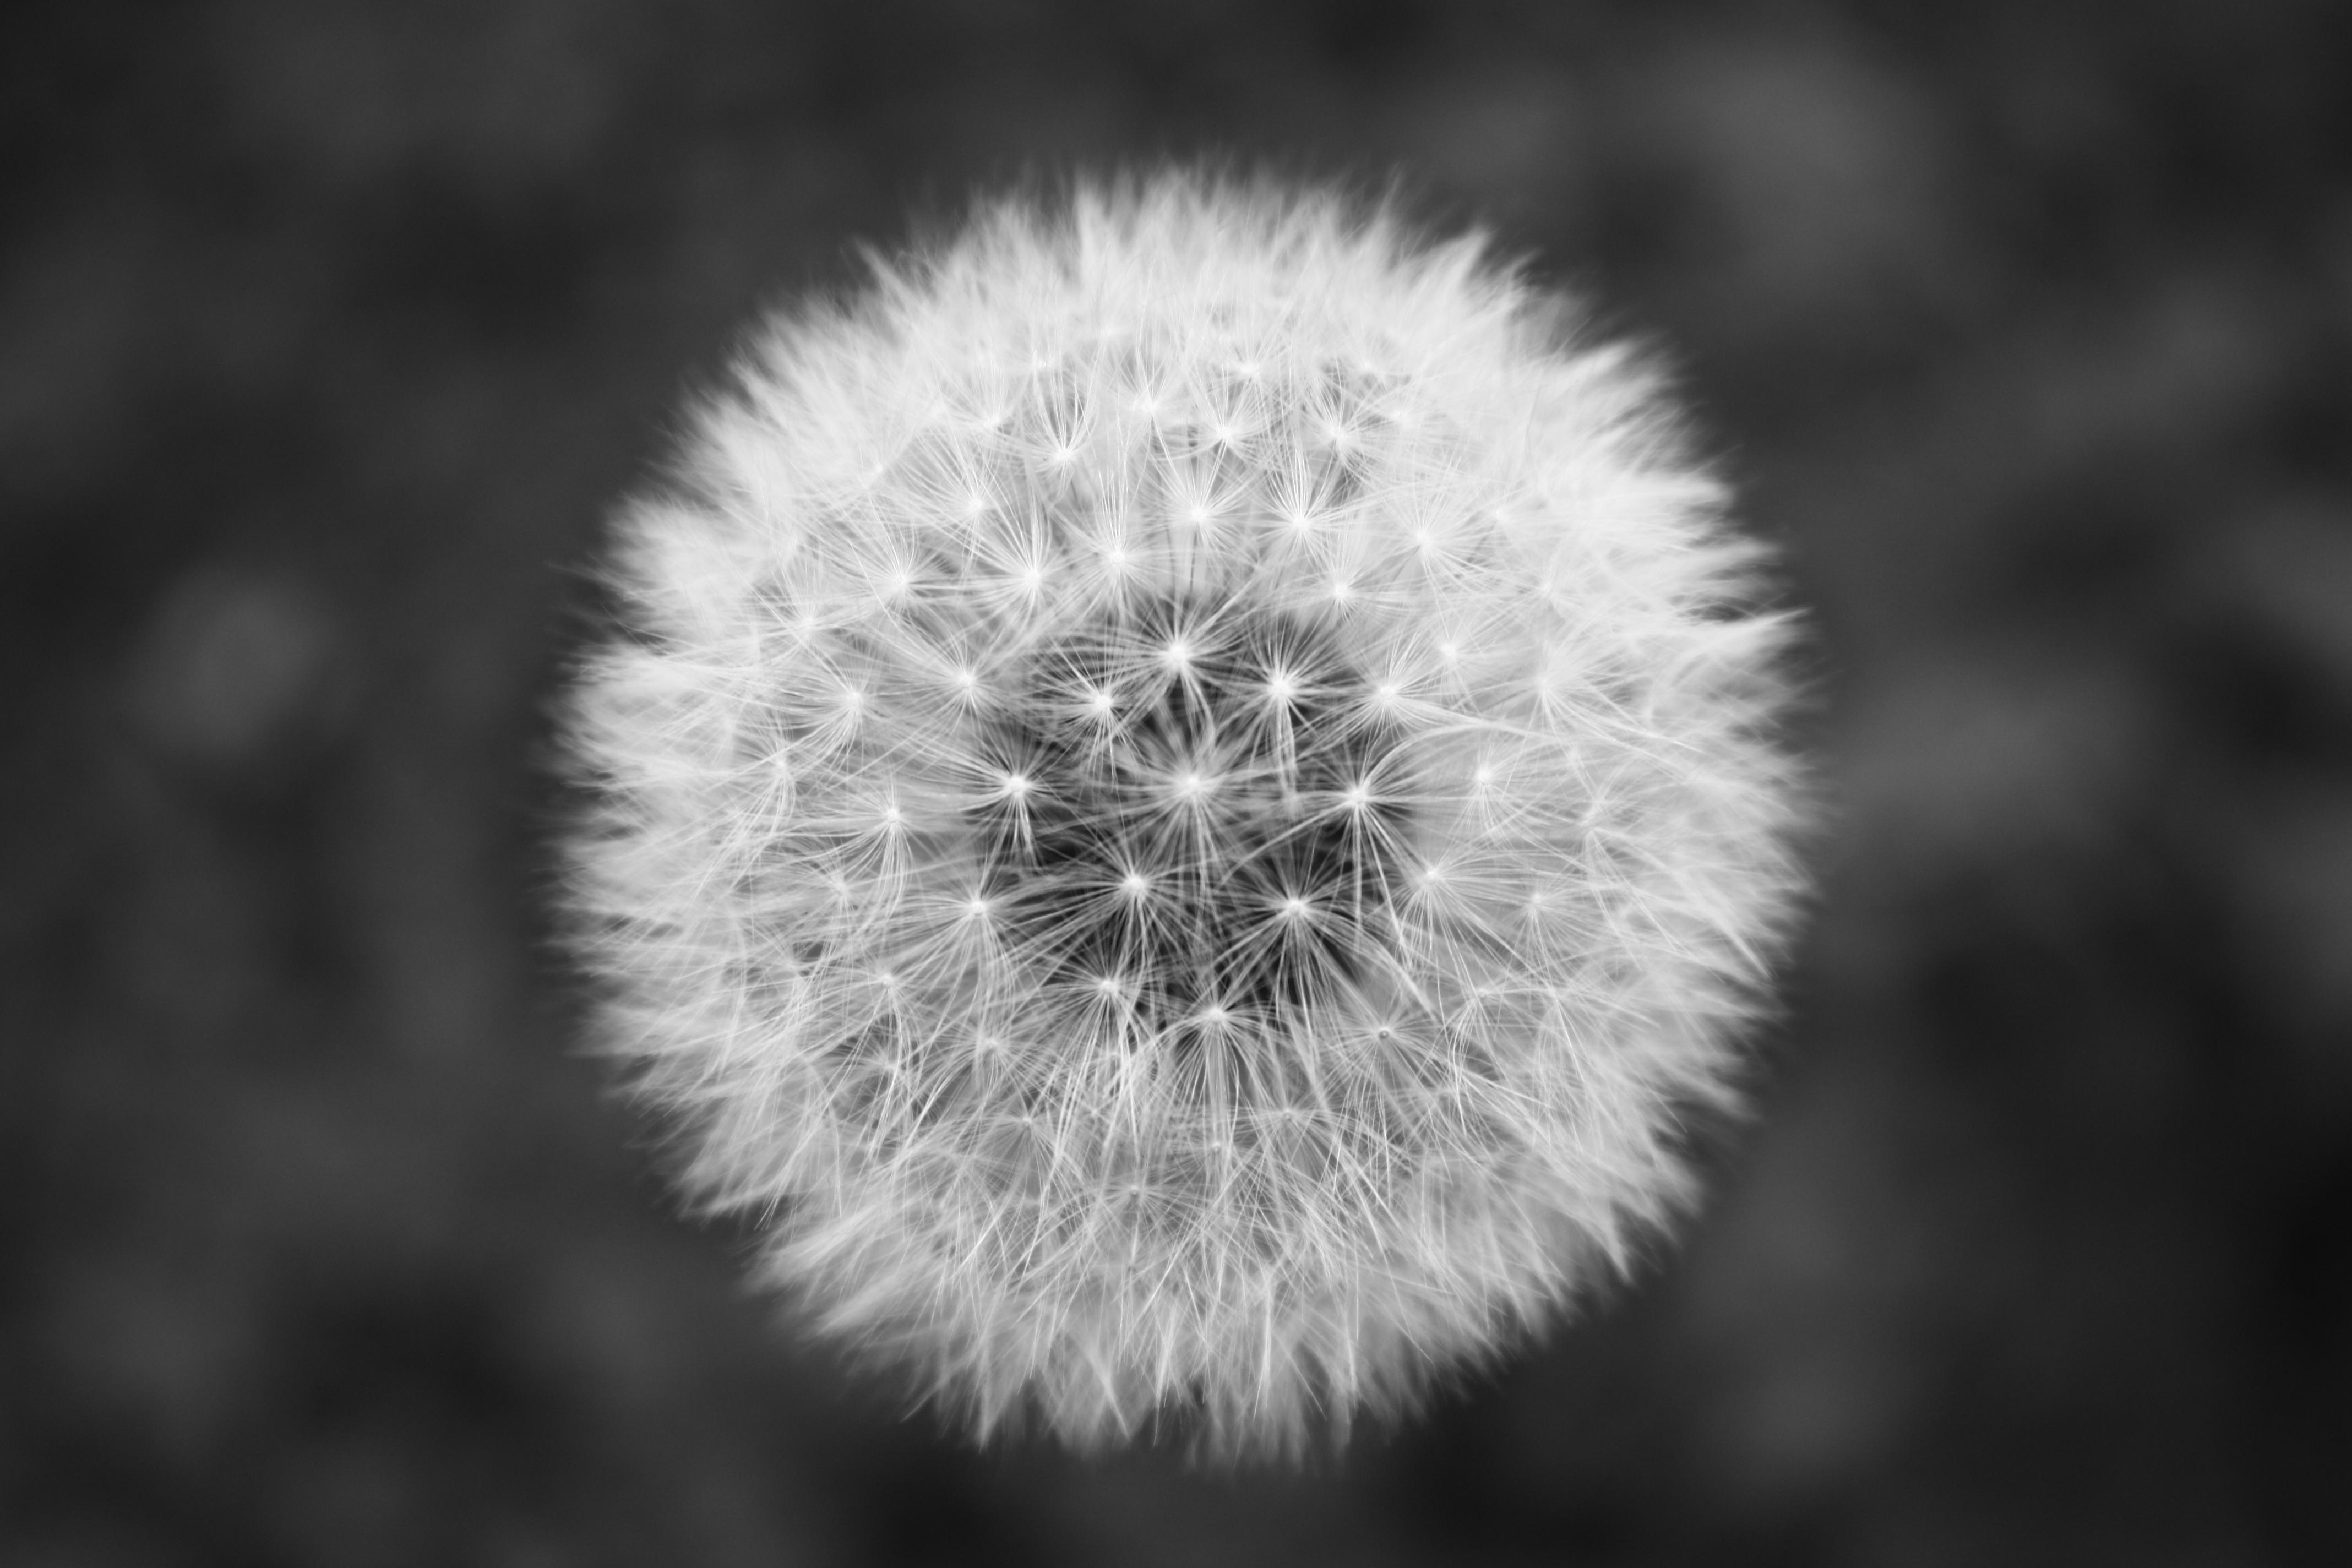 Dandelion Grayscale Photography